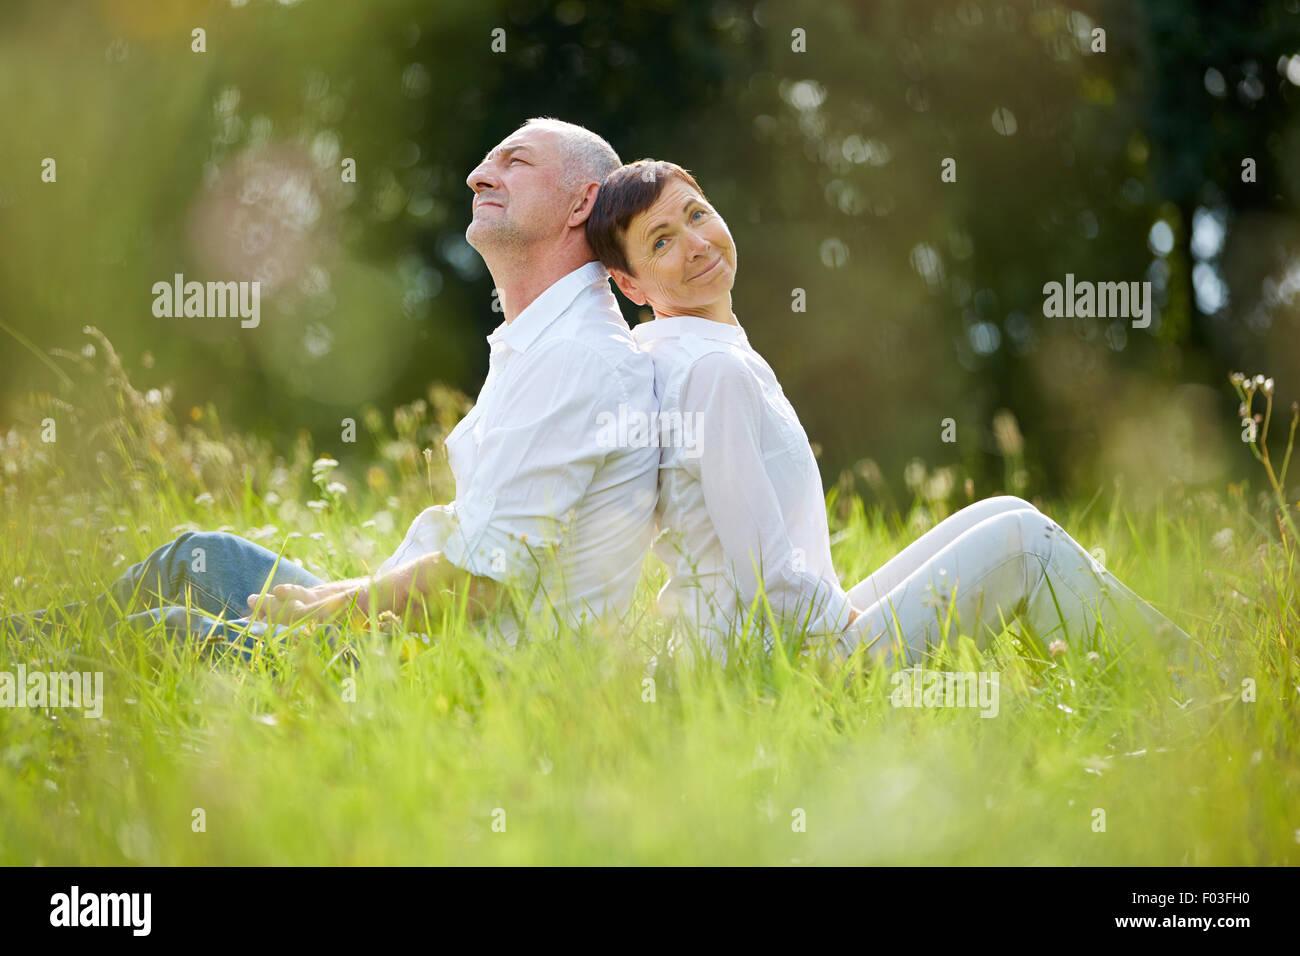 Senior couple relaxing in nature en été Photo Stock